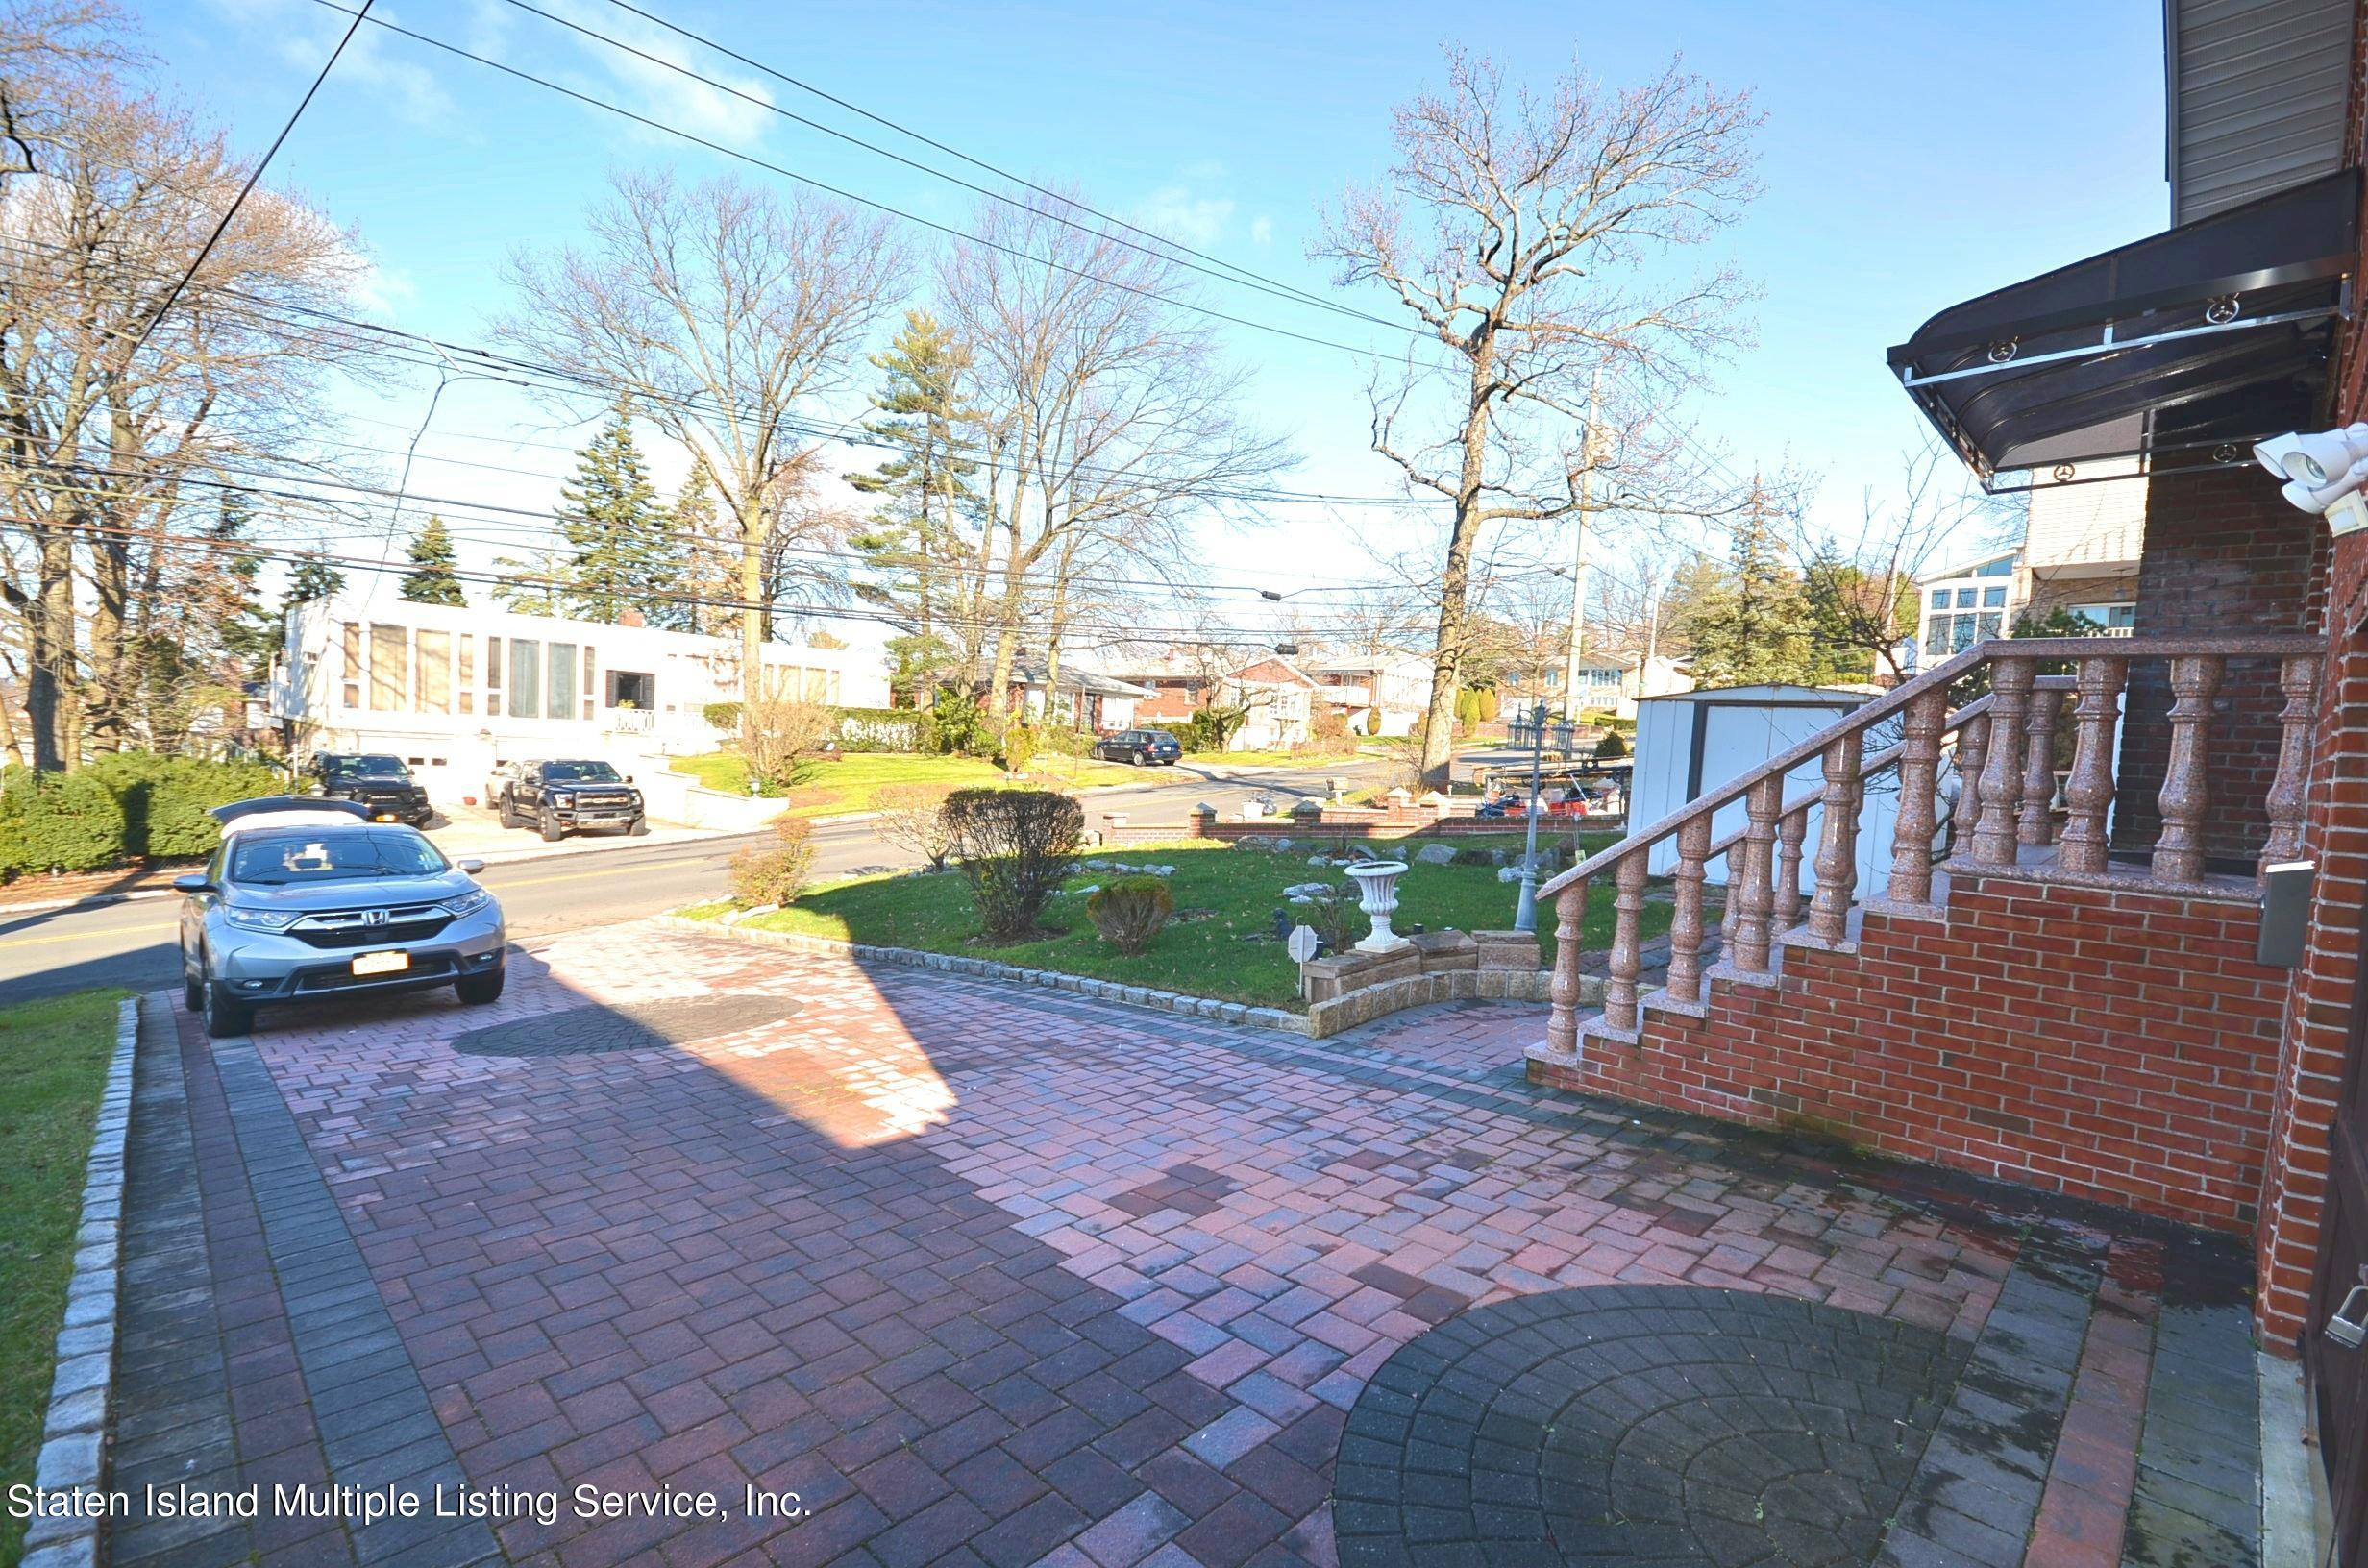 Single Family - Detached 48 Ocean Terrace  Staten Island, NY 10314, MLS-1142240-5